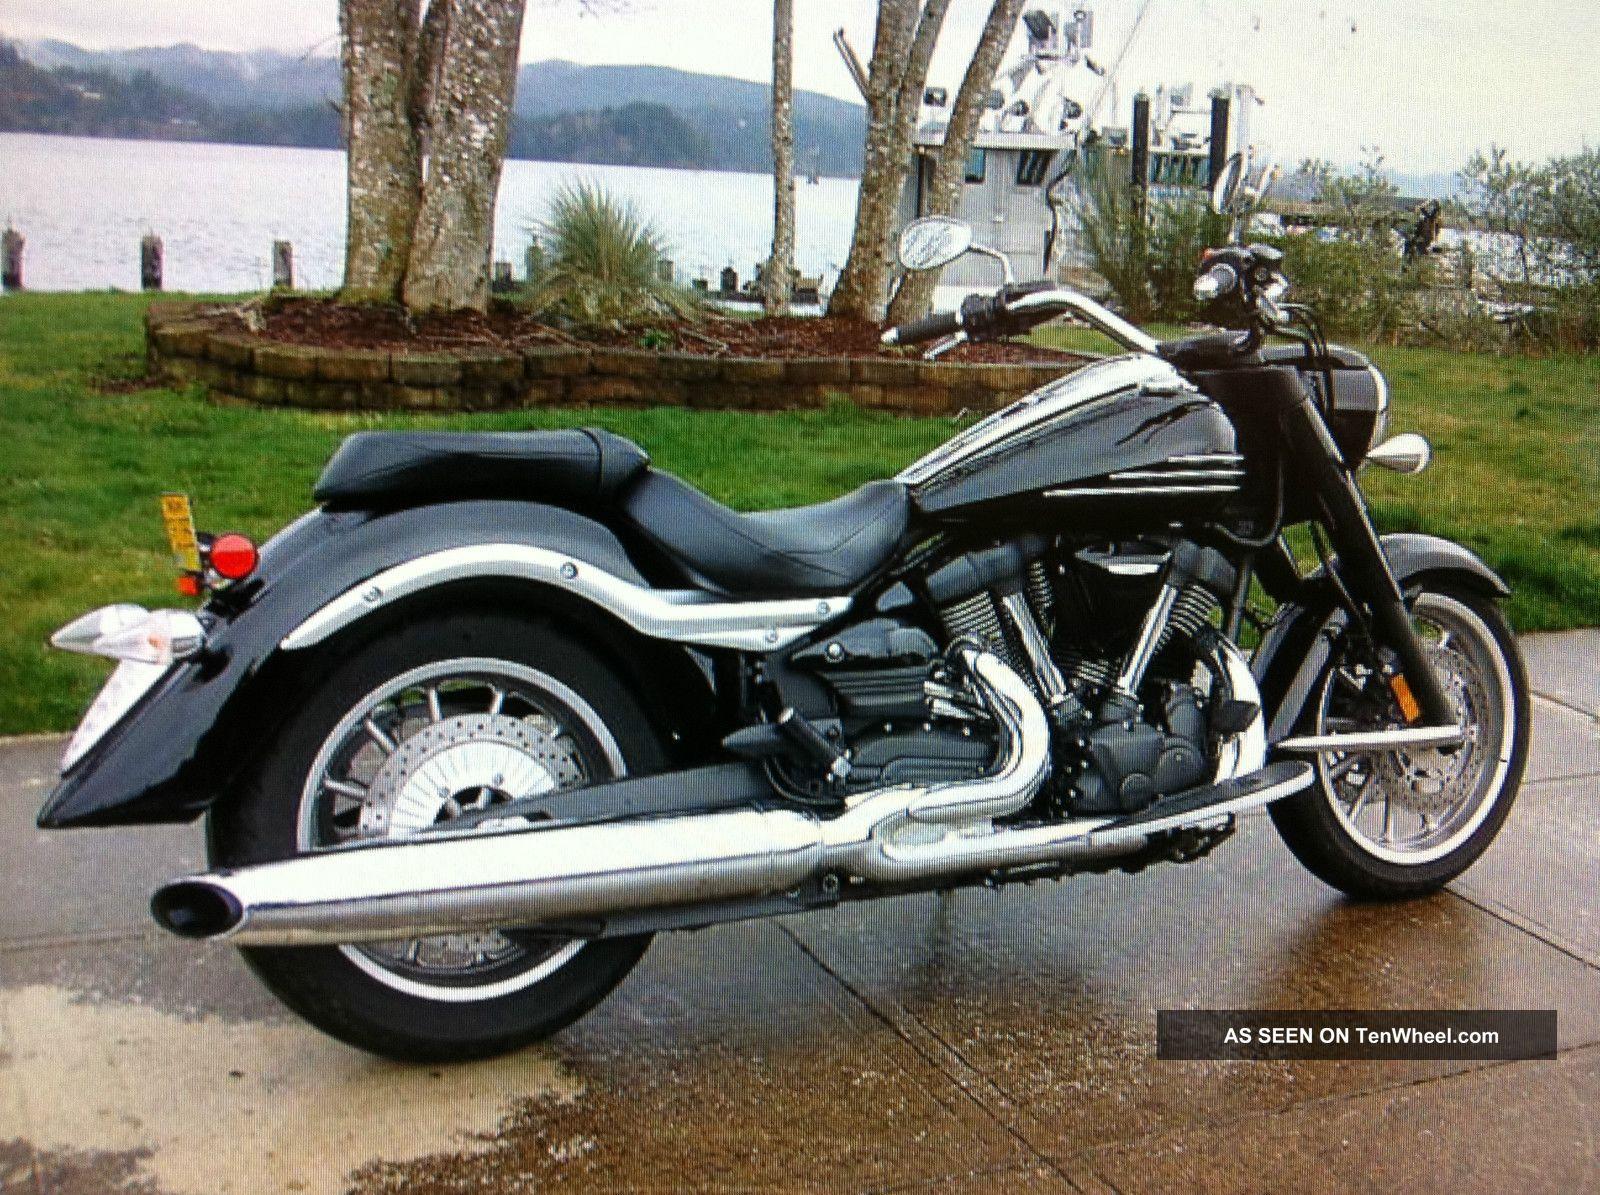 1900 cc yamaha motorcycle disrespect1st com rh disrespect1st com